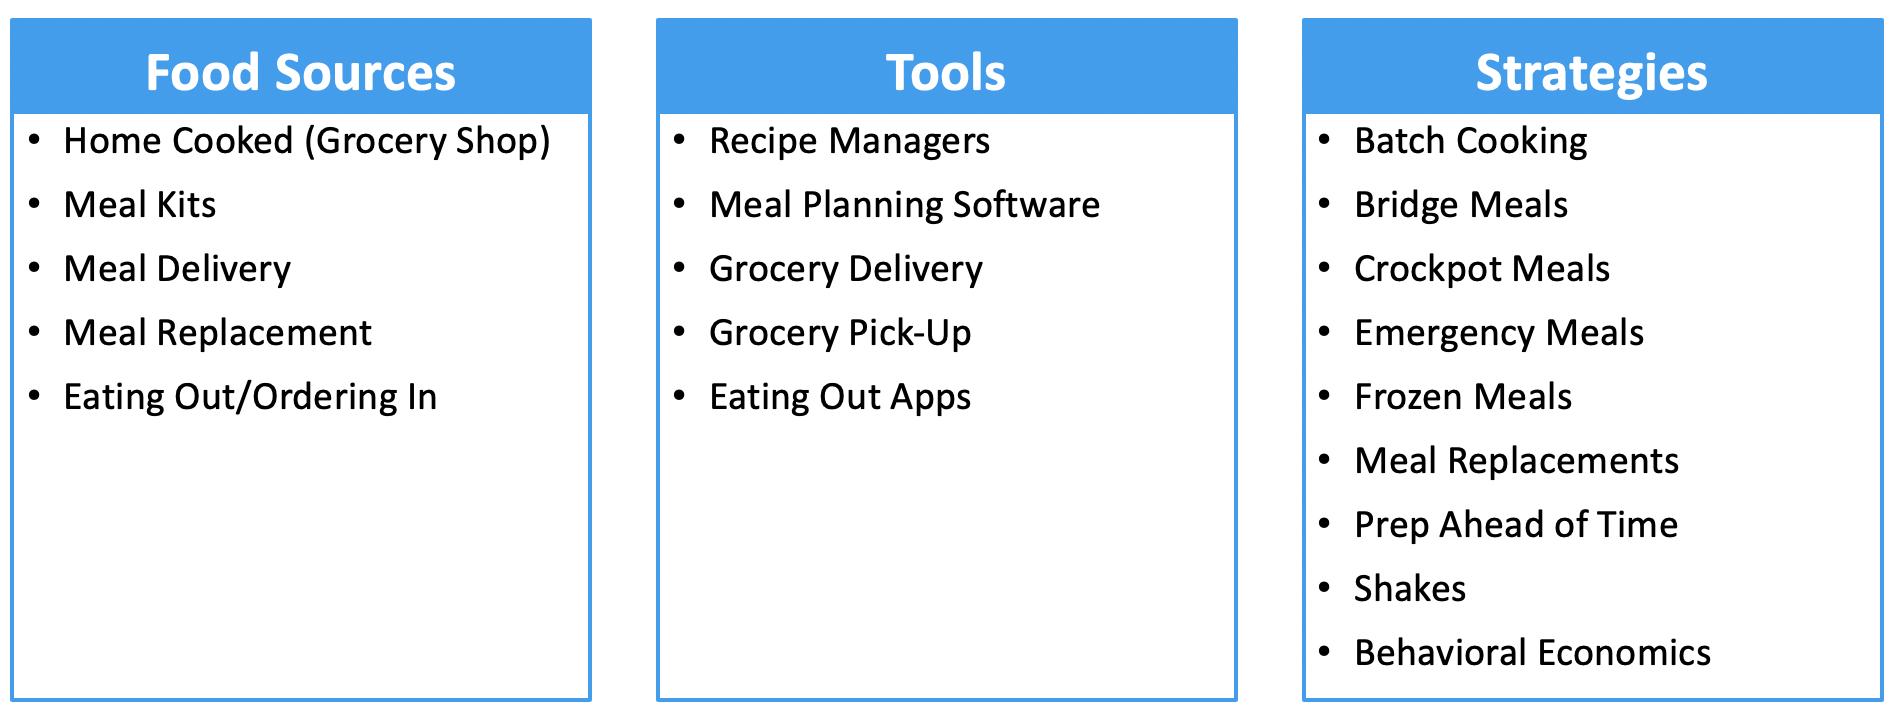 Food_Sources--Tools--Strategies_122718.png